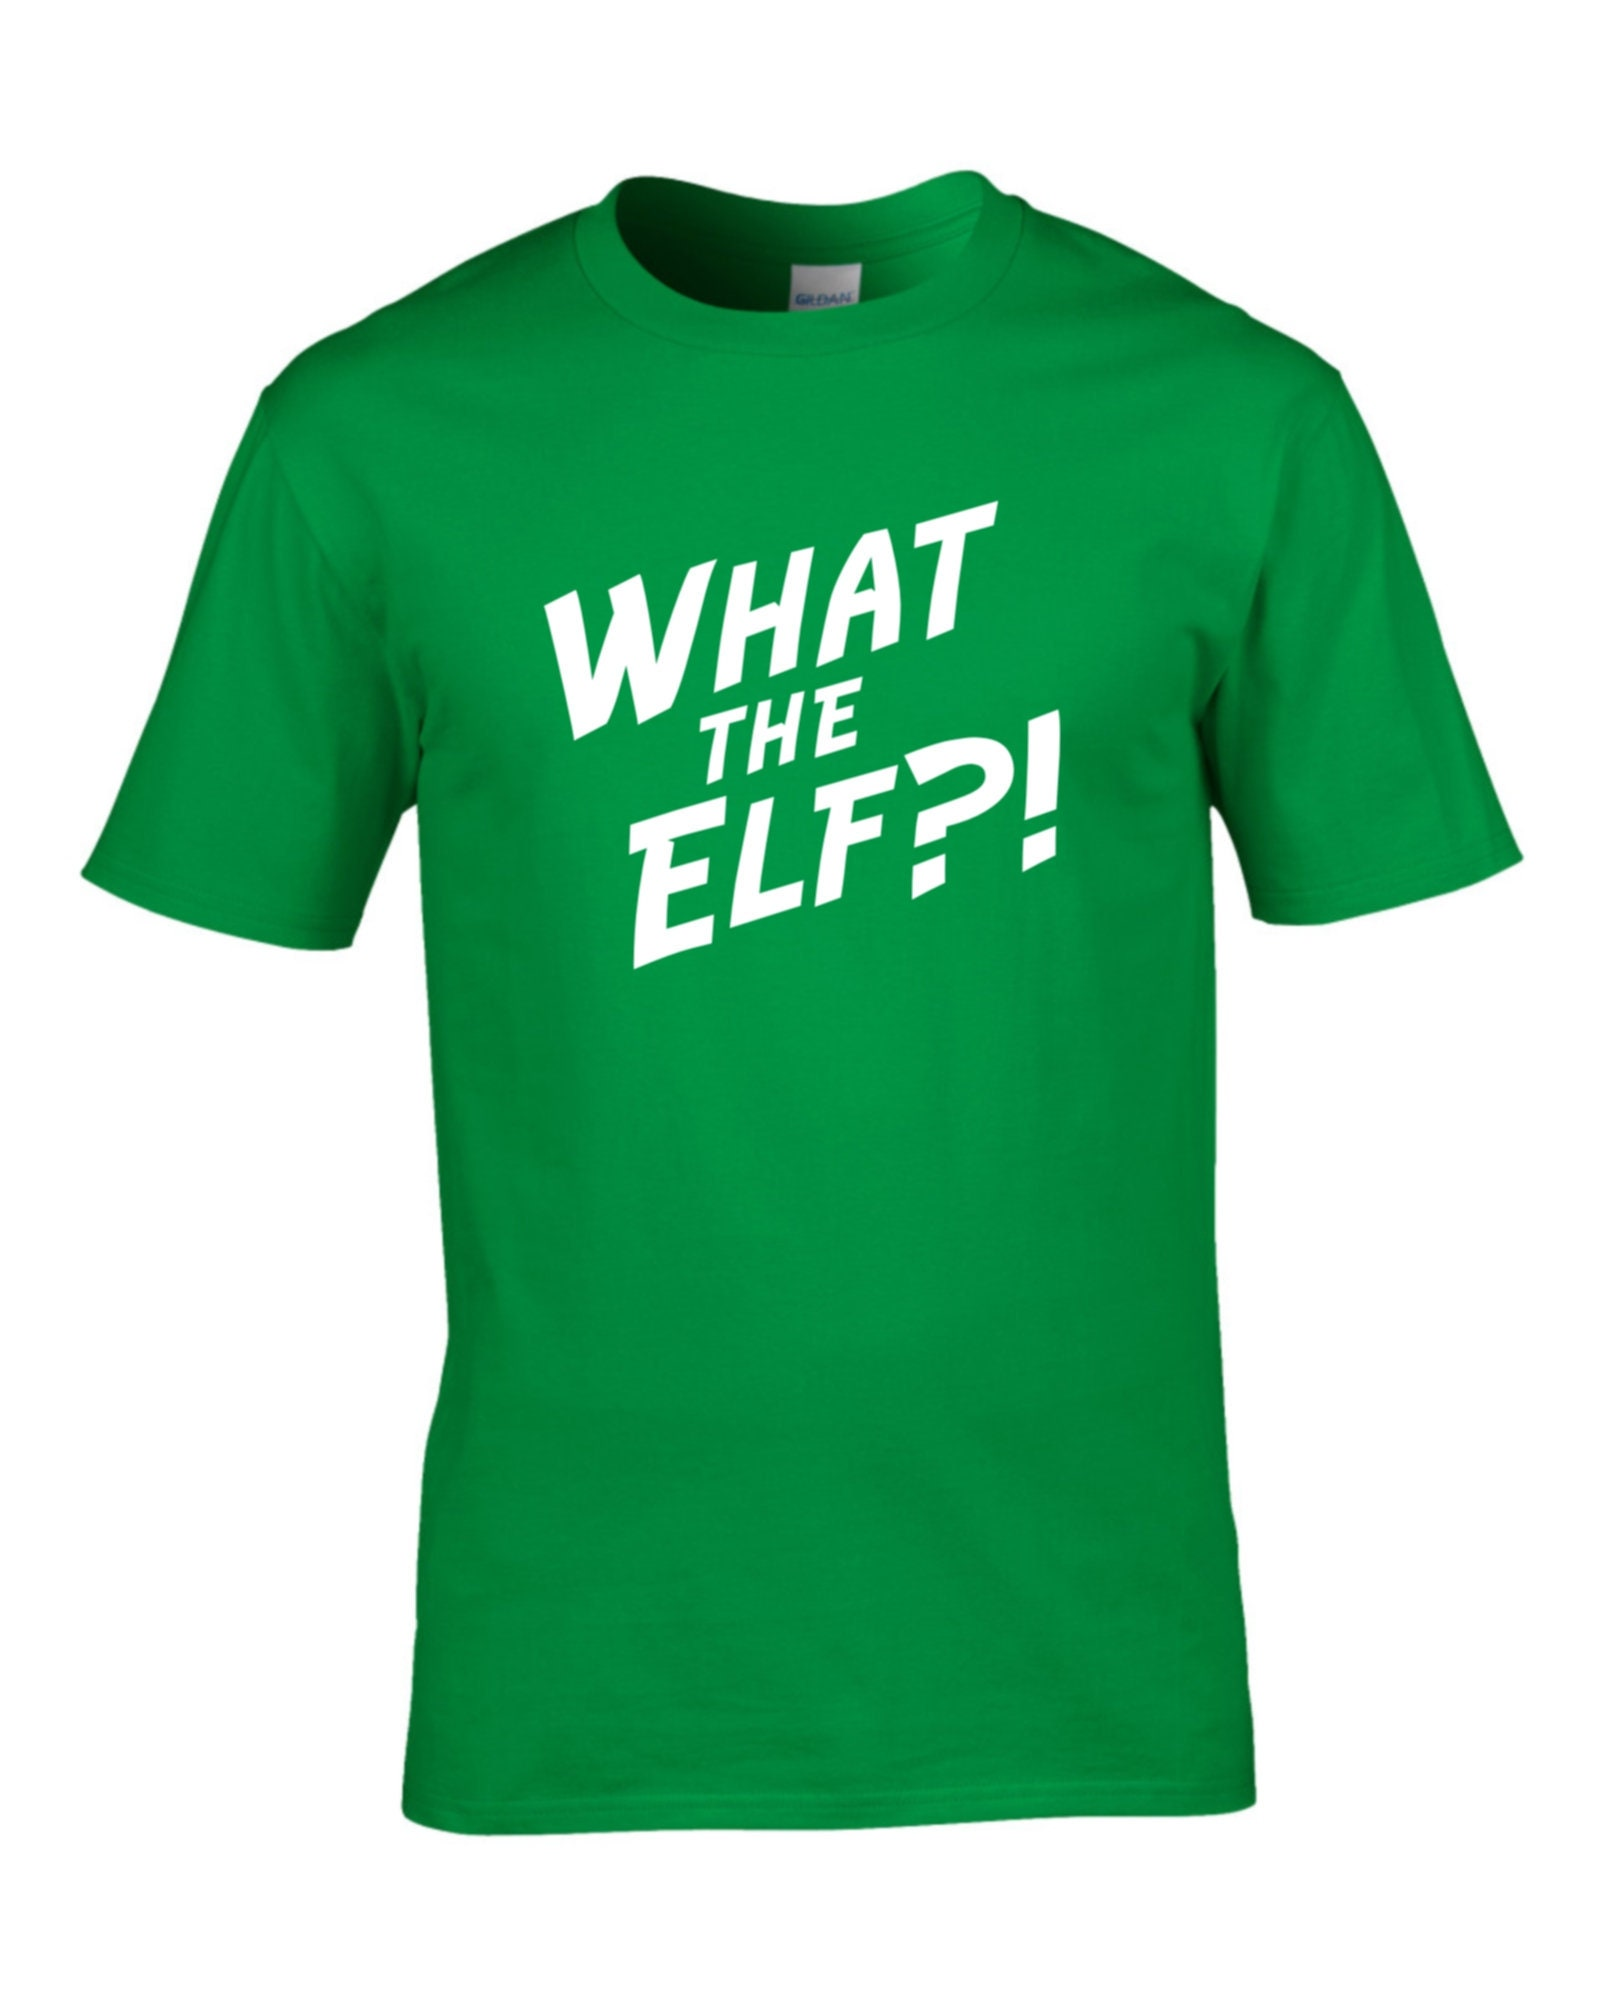 Men\'s Christmas t-shirts, What the Elf t shirt, Funny Christmas t ...